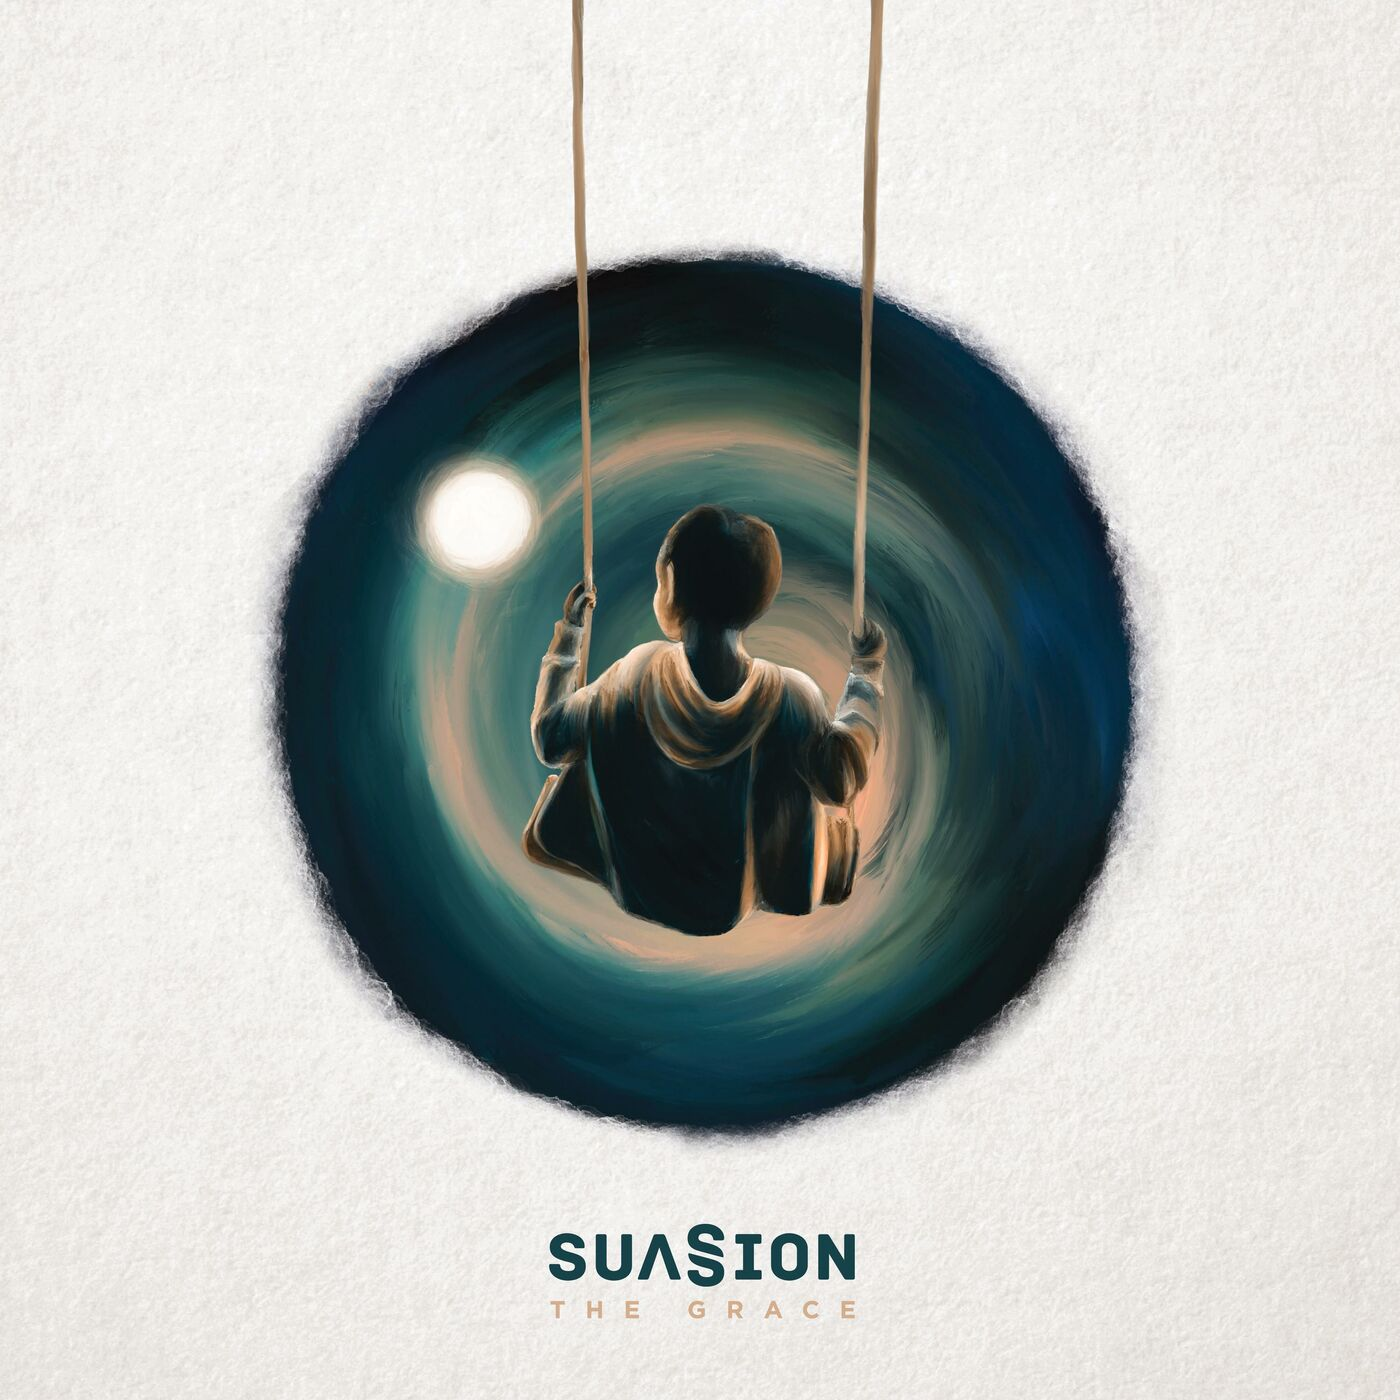 Suasion - The Grace [single] (2019)